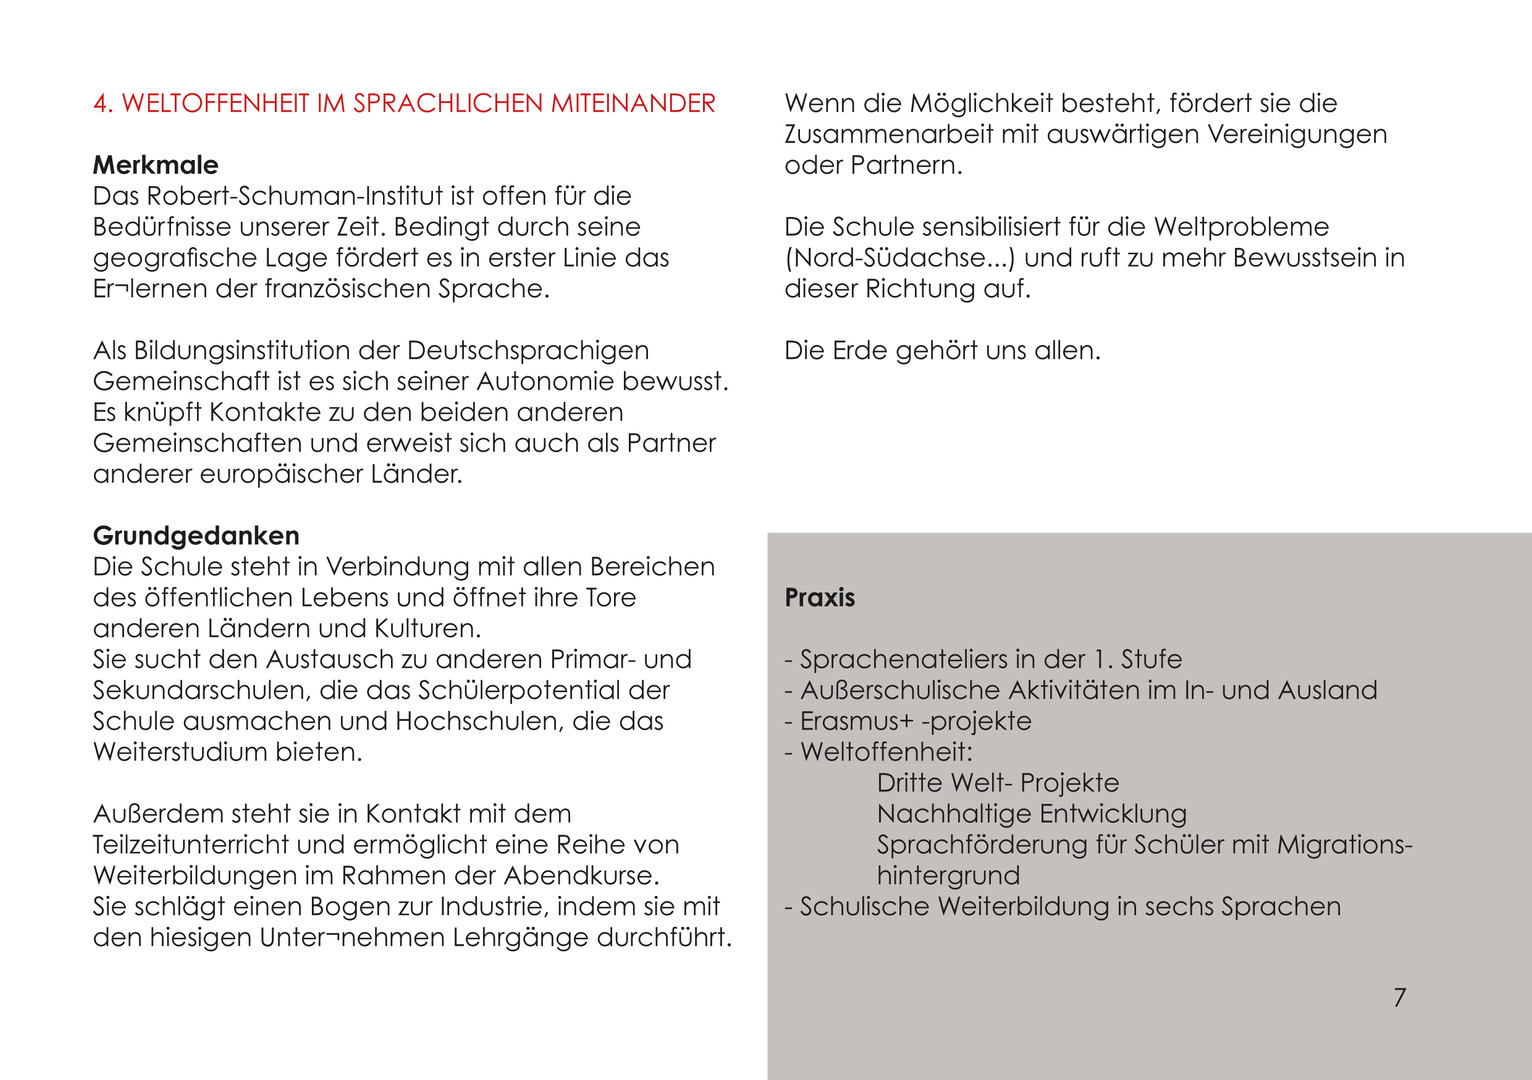 1.StufeDruck2019-9.jpeg